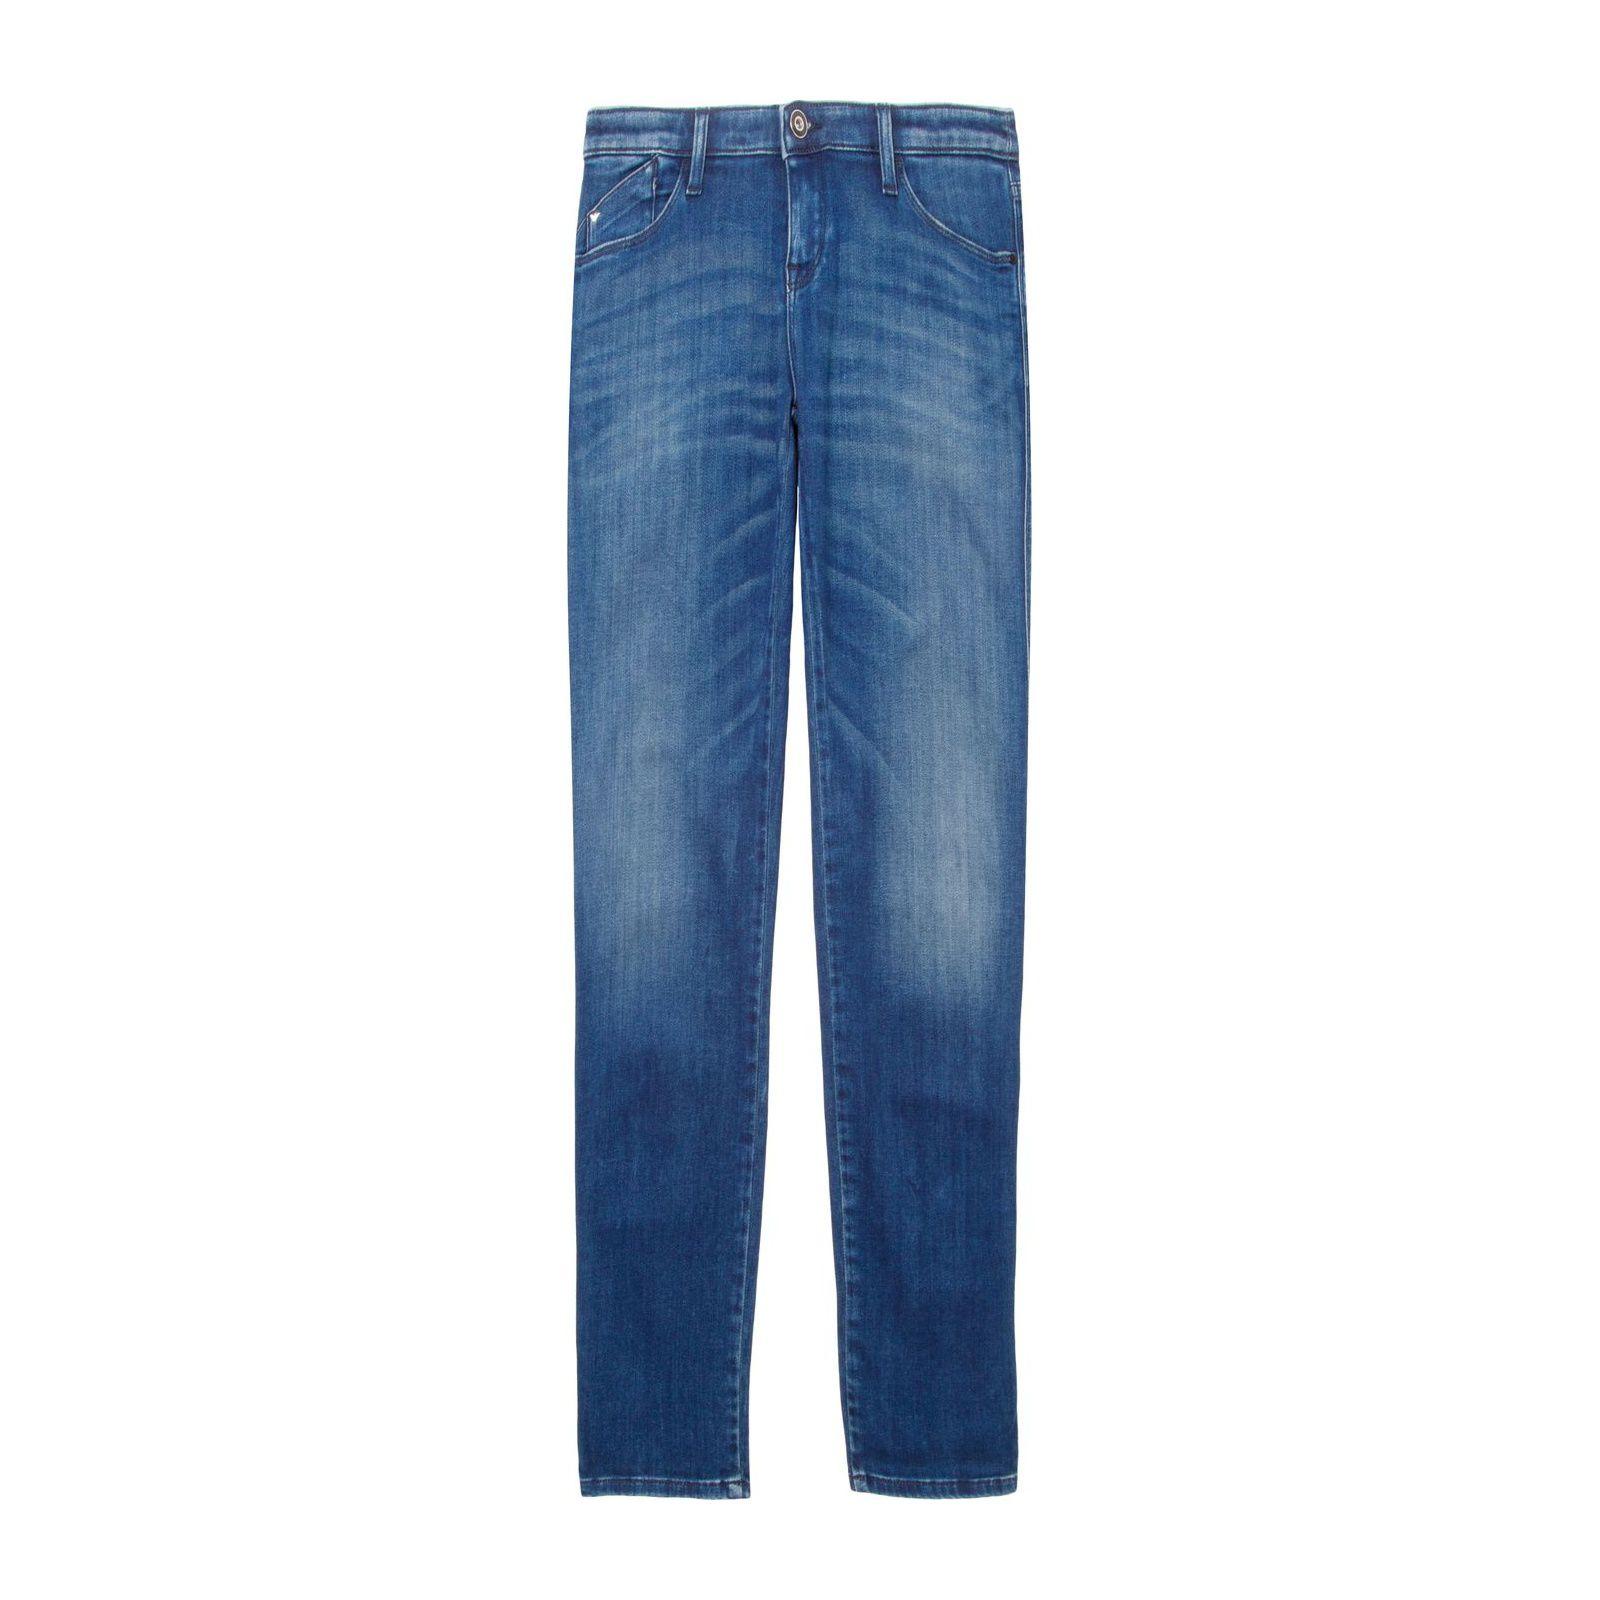 Calça Jeans Skinny J06 Lotus